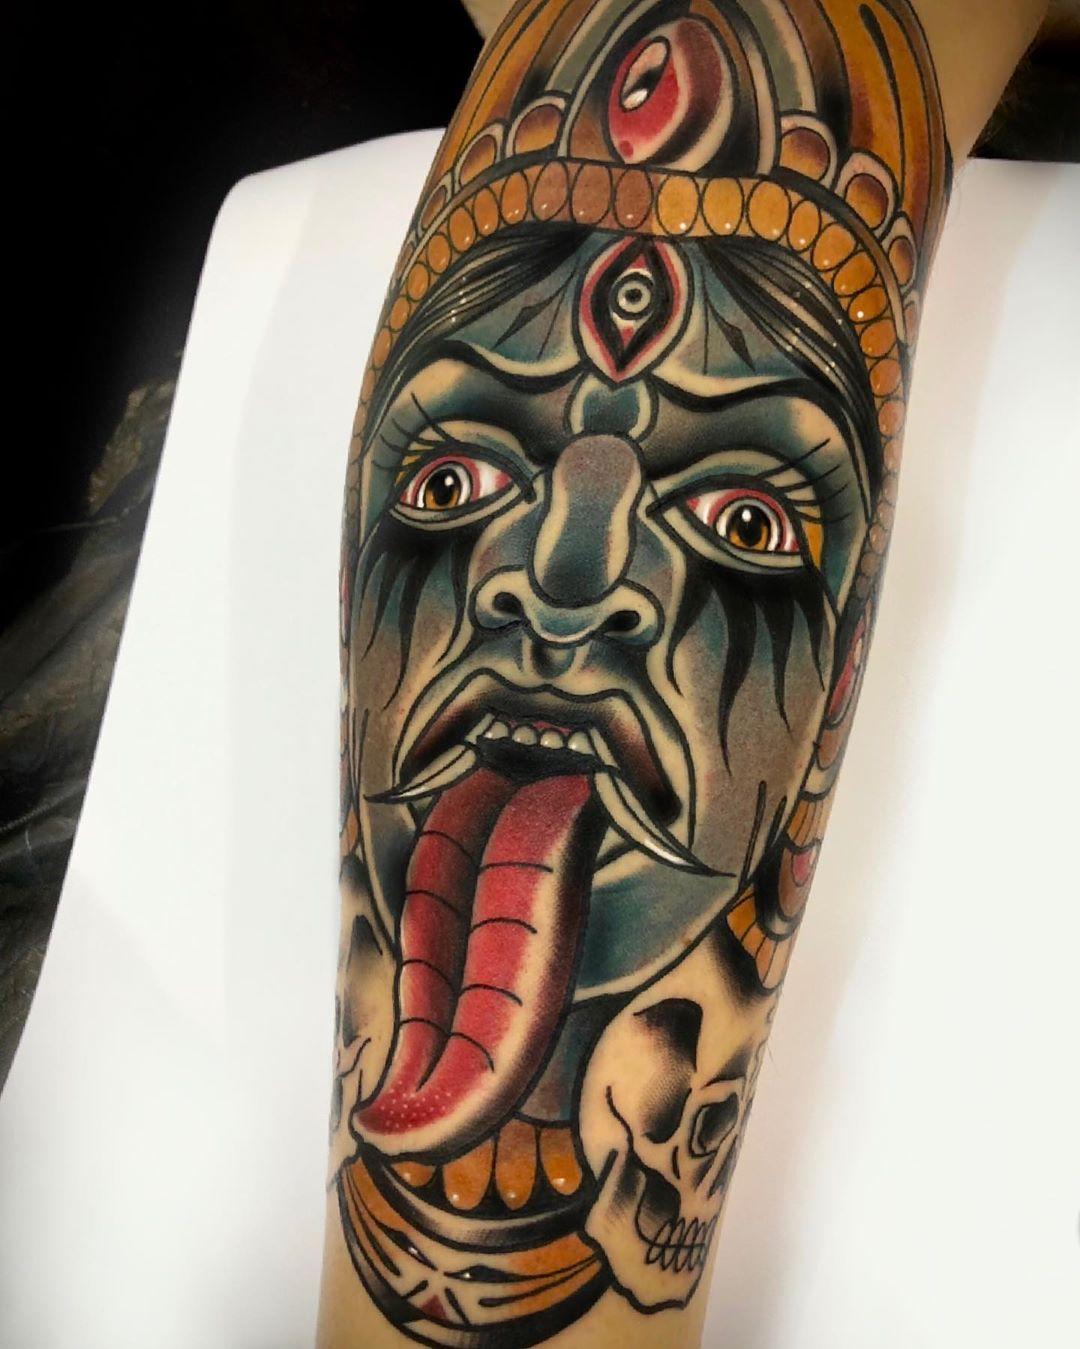 followforfollow,berlin,followmeciudadreal,ciudadreal,tomelloso,almagro,puertollano,tatuajesenpuertollano,tatuajesendaimiel,ciudadrealtattoo,ciudadrealtatuajes,tatuajesciudadreal,follow,ciudadrealtatuajes,puertollano,tattooers,besttattooers,juantabasco,ciudadrealsetatua,ink,tatuajes,realismo,realistictattoo,ciudadrealtattoo,tatuajesenpuertollano,traditionaltattoos,castillalamancha,ink,tattooart,zurichtattoo,daimiel,inkedgirls,inkig,ink,inktattoosb